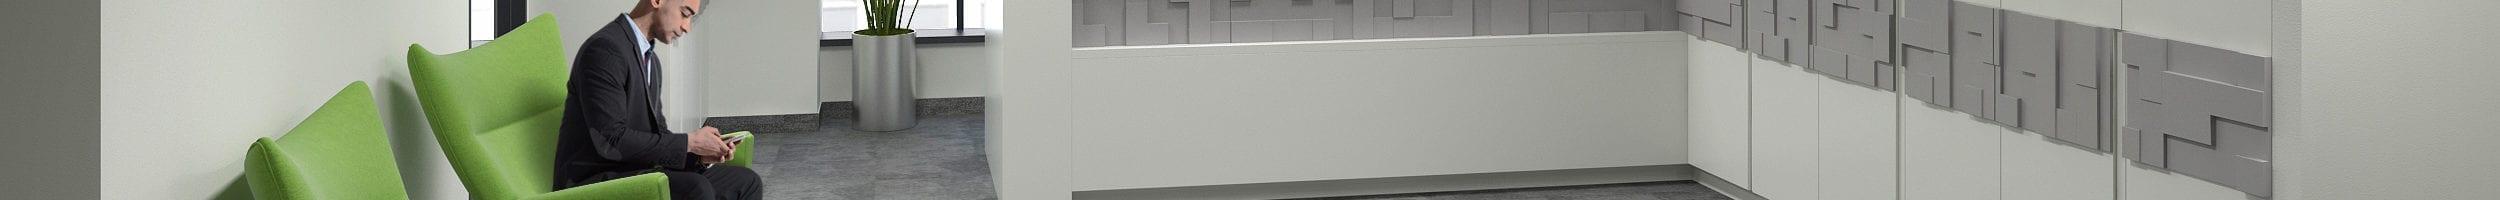 Equatex 2500x200 - Interbiuro projektuje i aranżuje w ASTORIA Premium Office